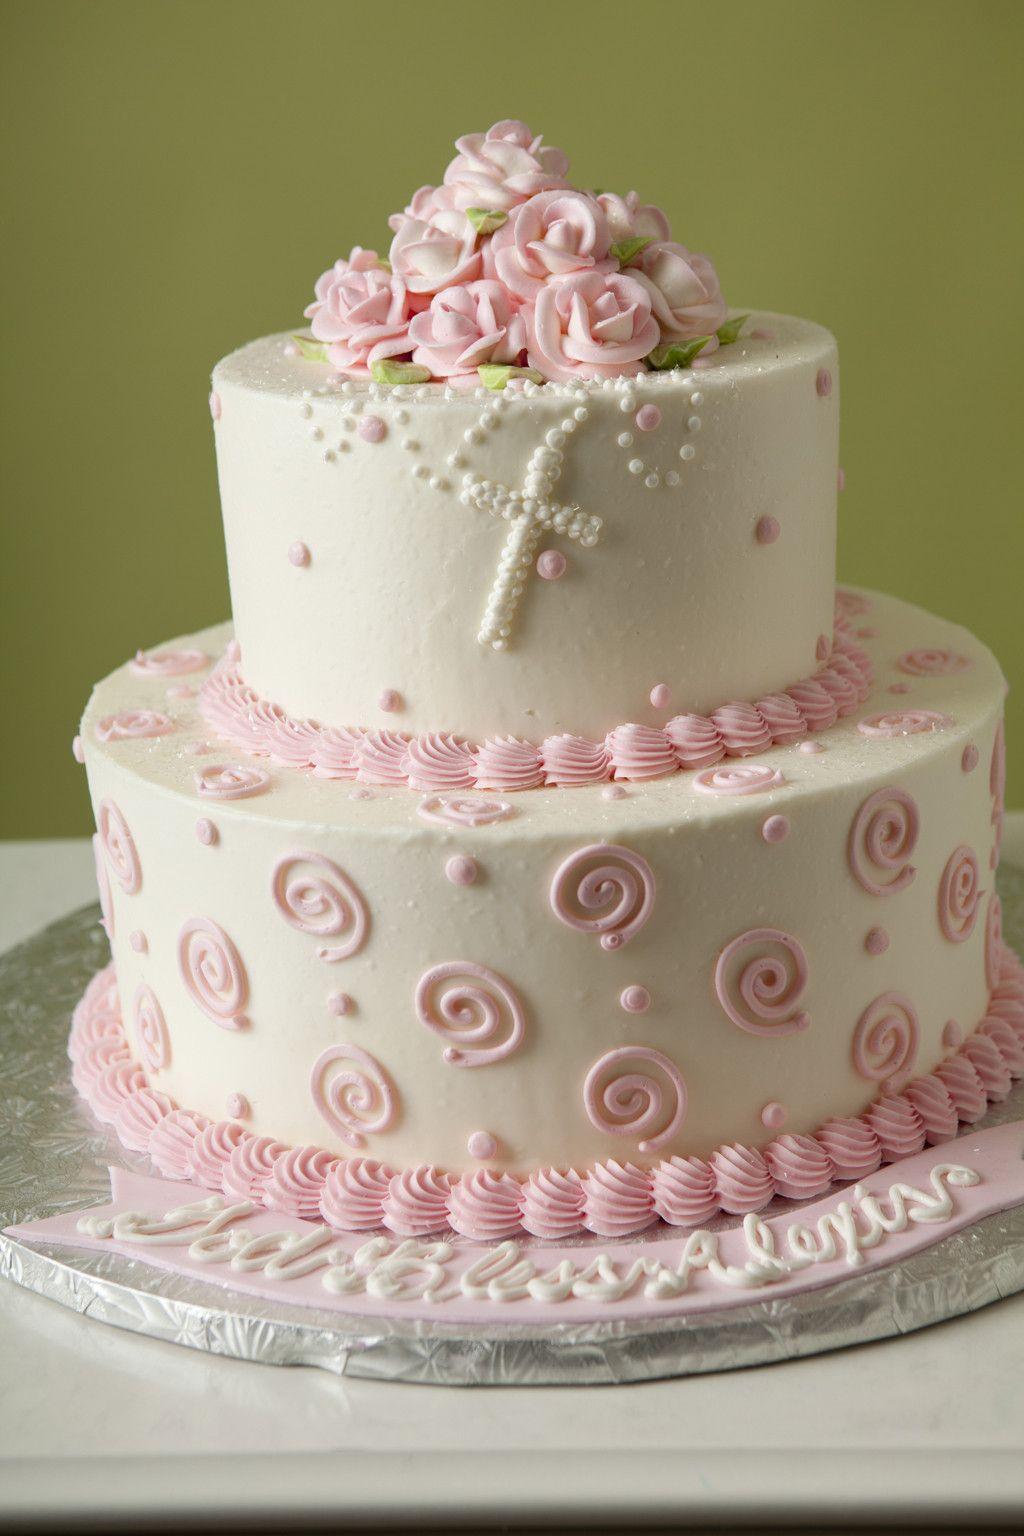 Single White Swirl Cake Pop